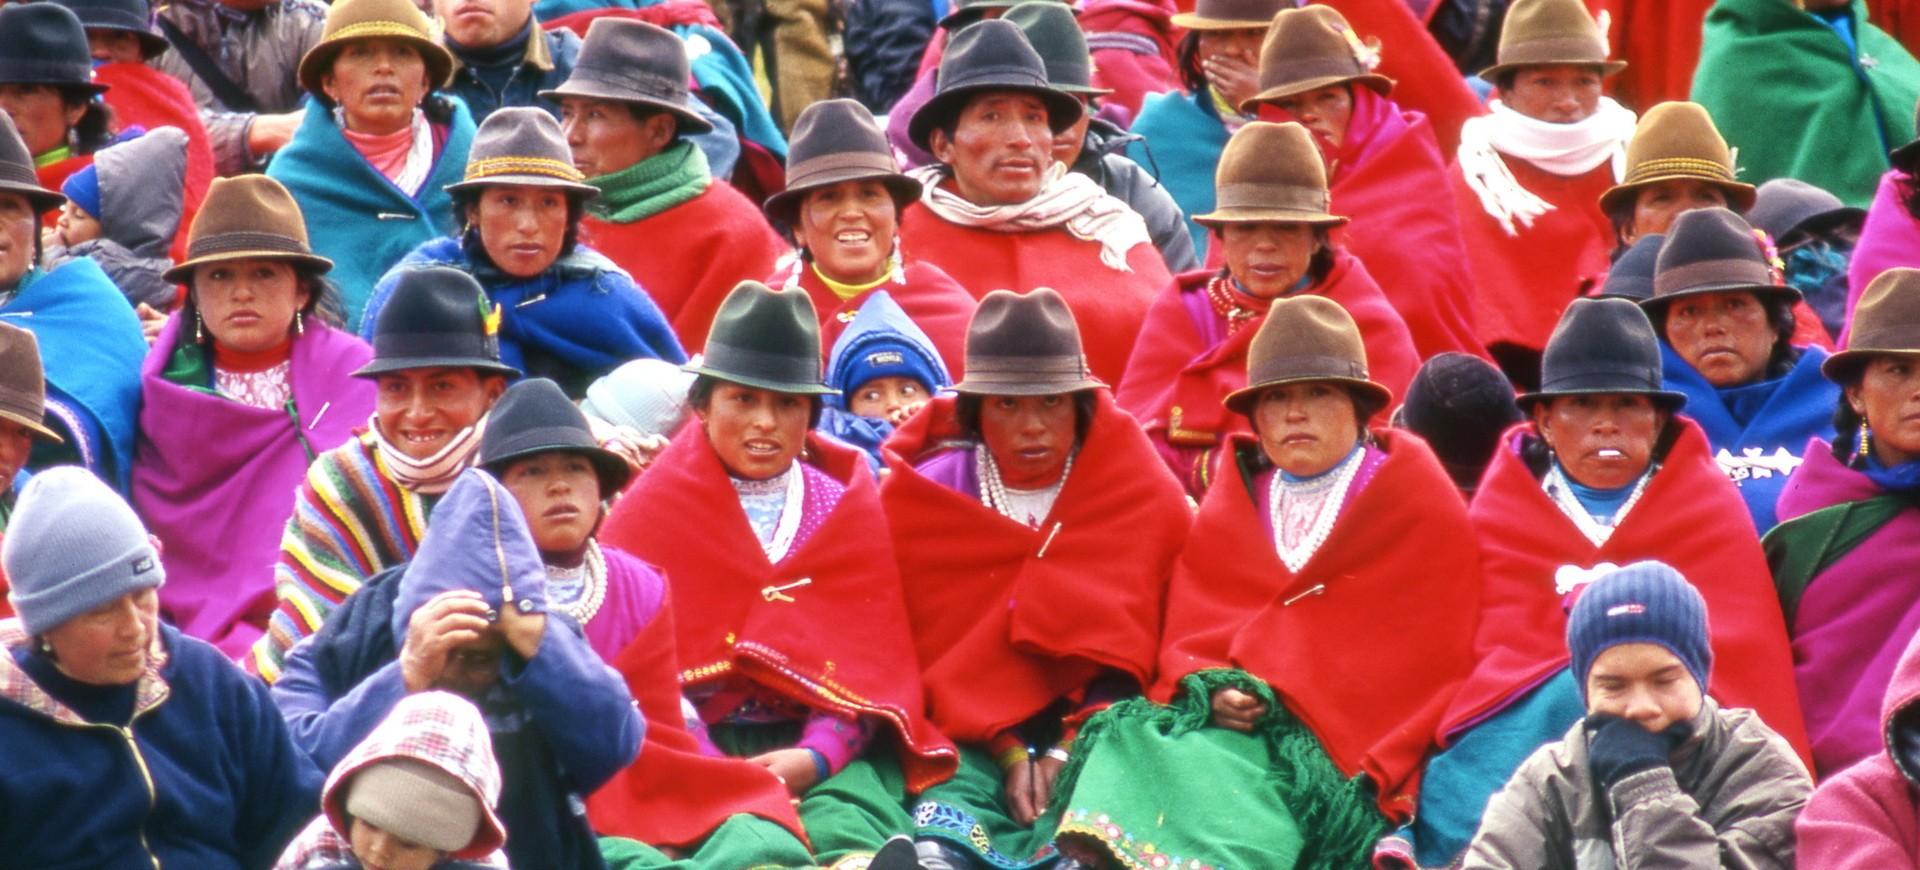 Population Indigène à Ozogoche en Equateur